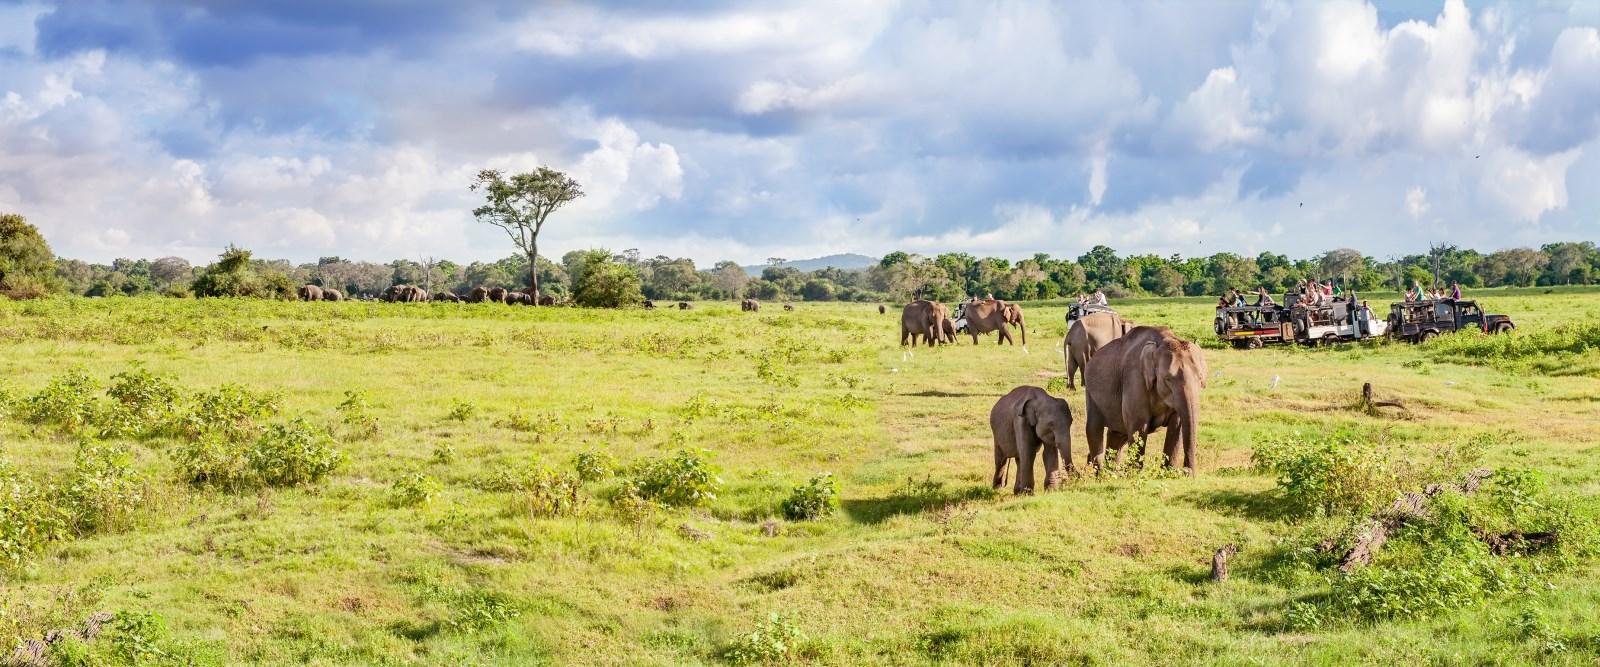 Travel Medicine for your safari.